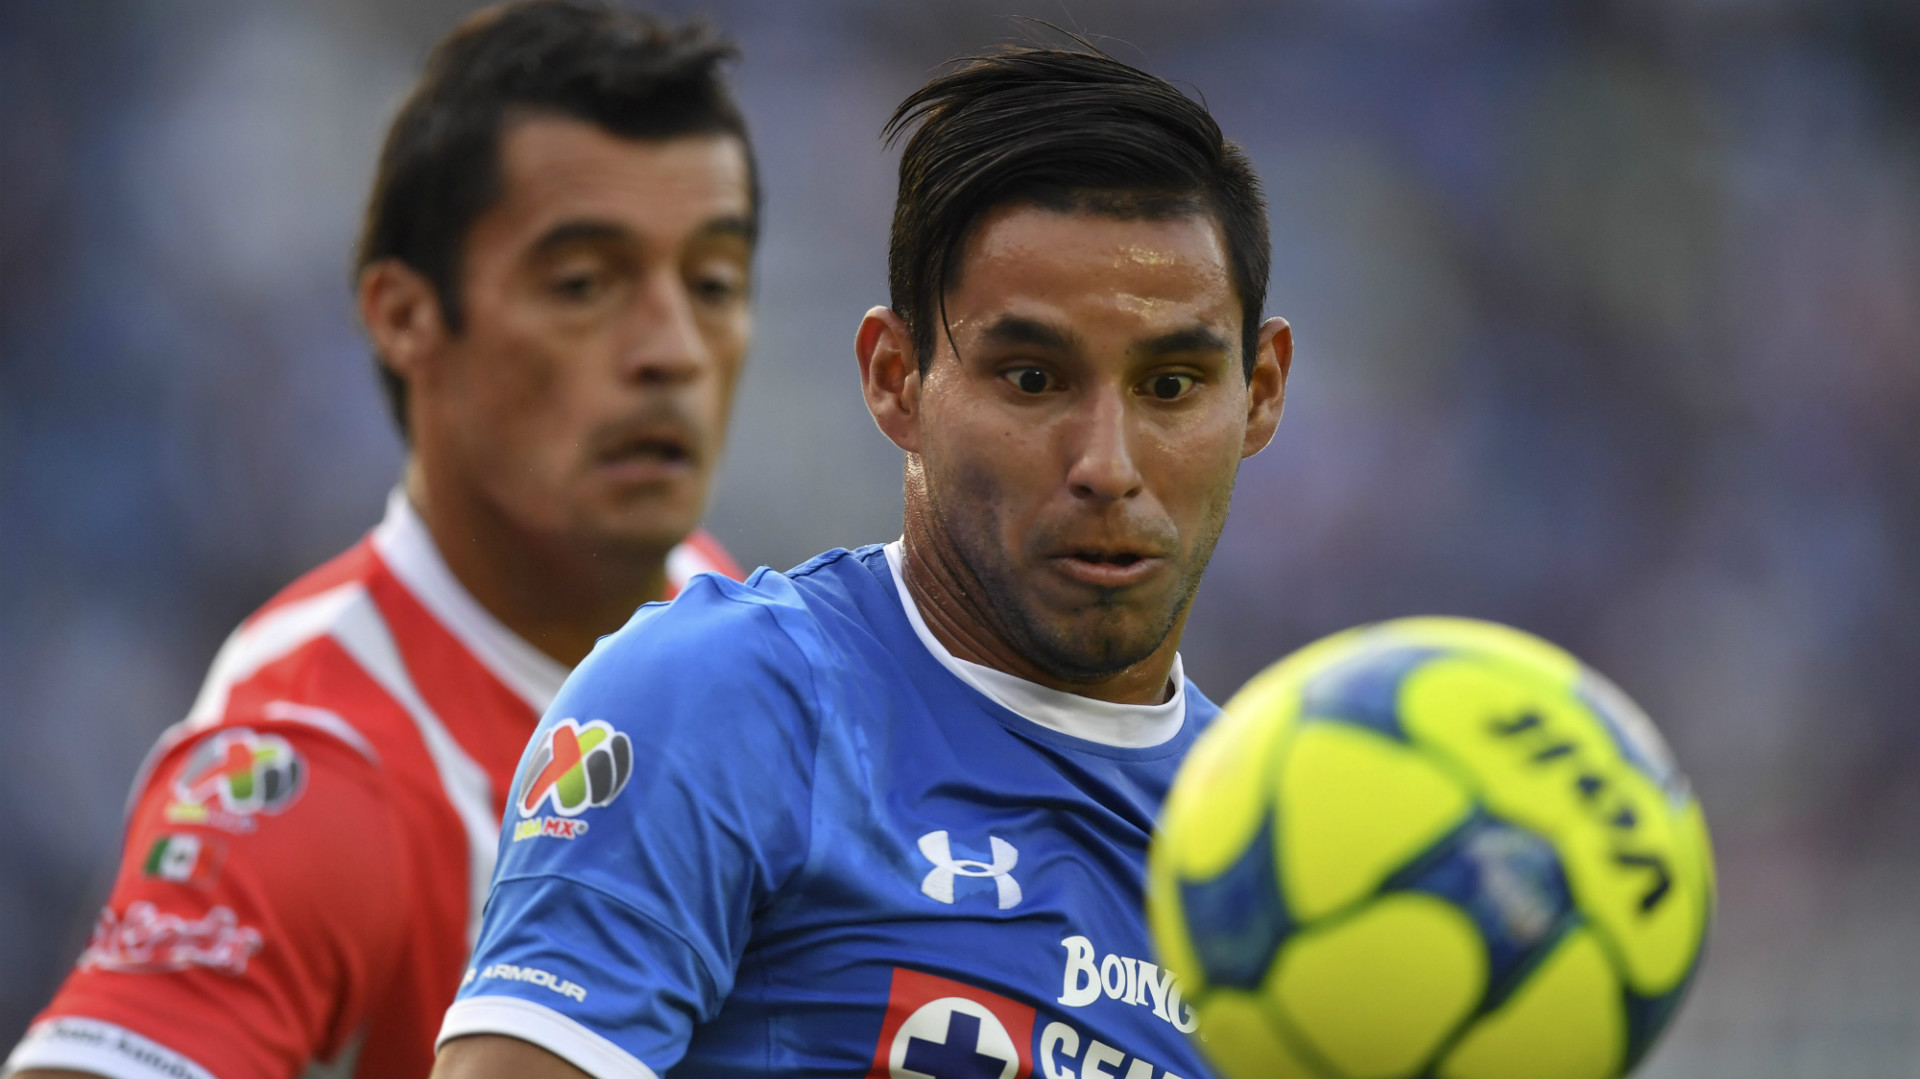 Jorge Benitez Cruz Azul